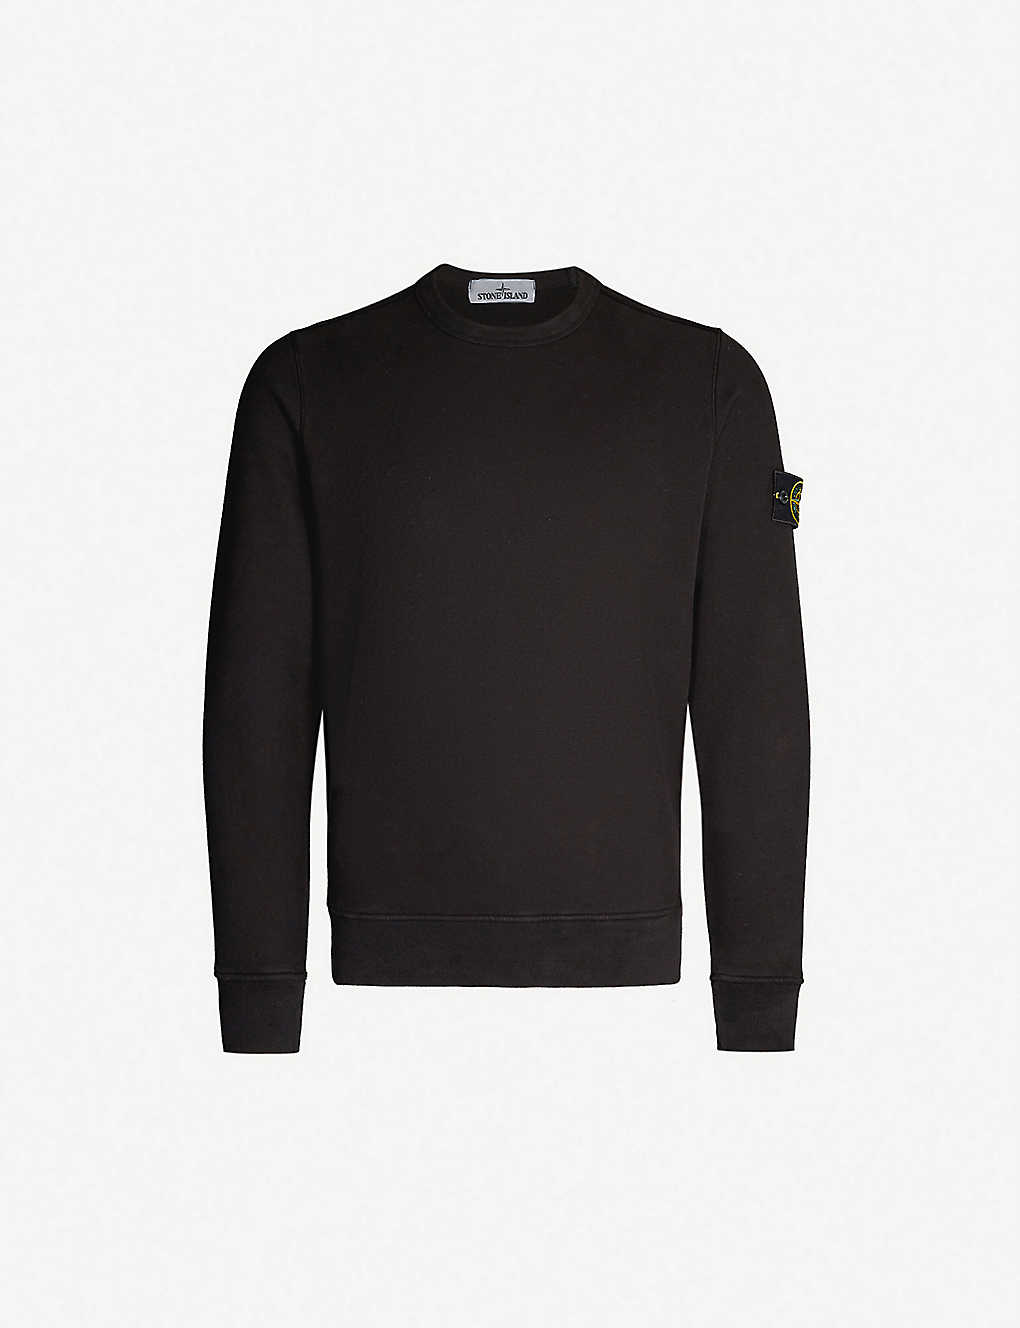 a11cb2d375169 STONE ISLAND - Crewneck cotton-jersey sweatshirt | Selfridges.com